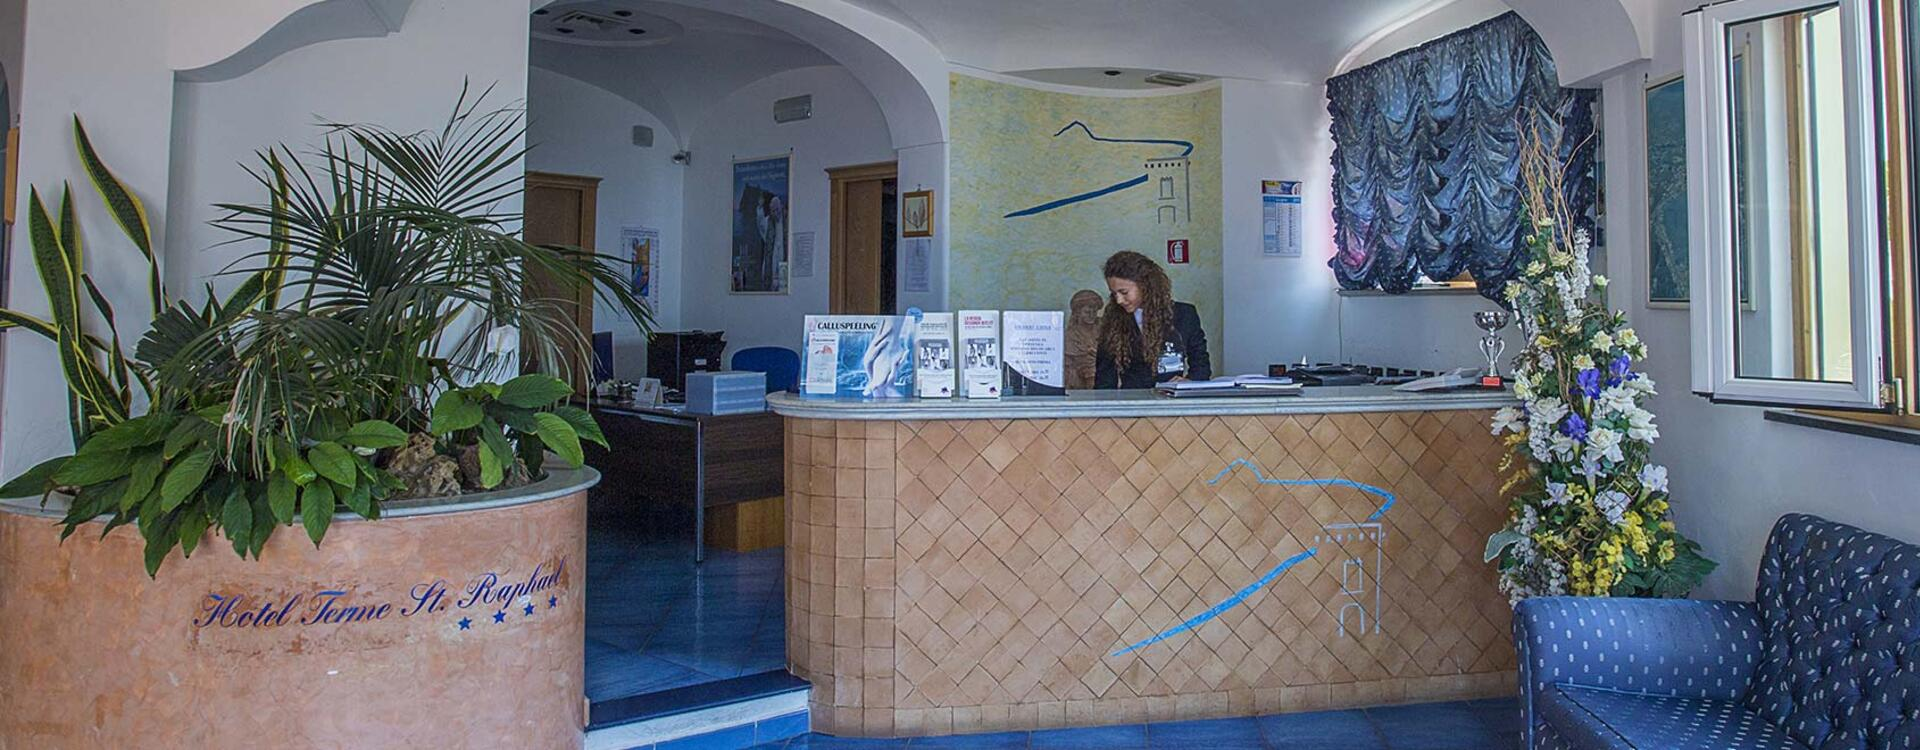 hotelsaintraphaelischia it contatti 009